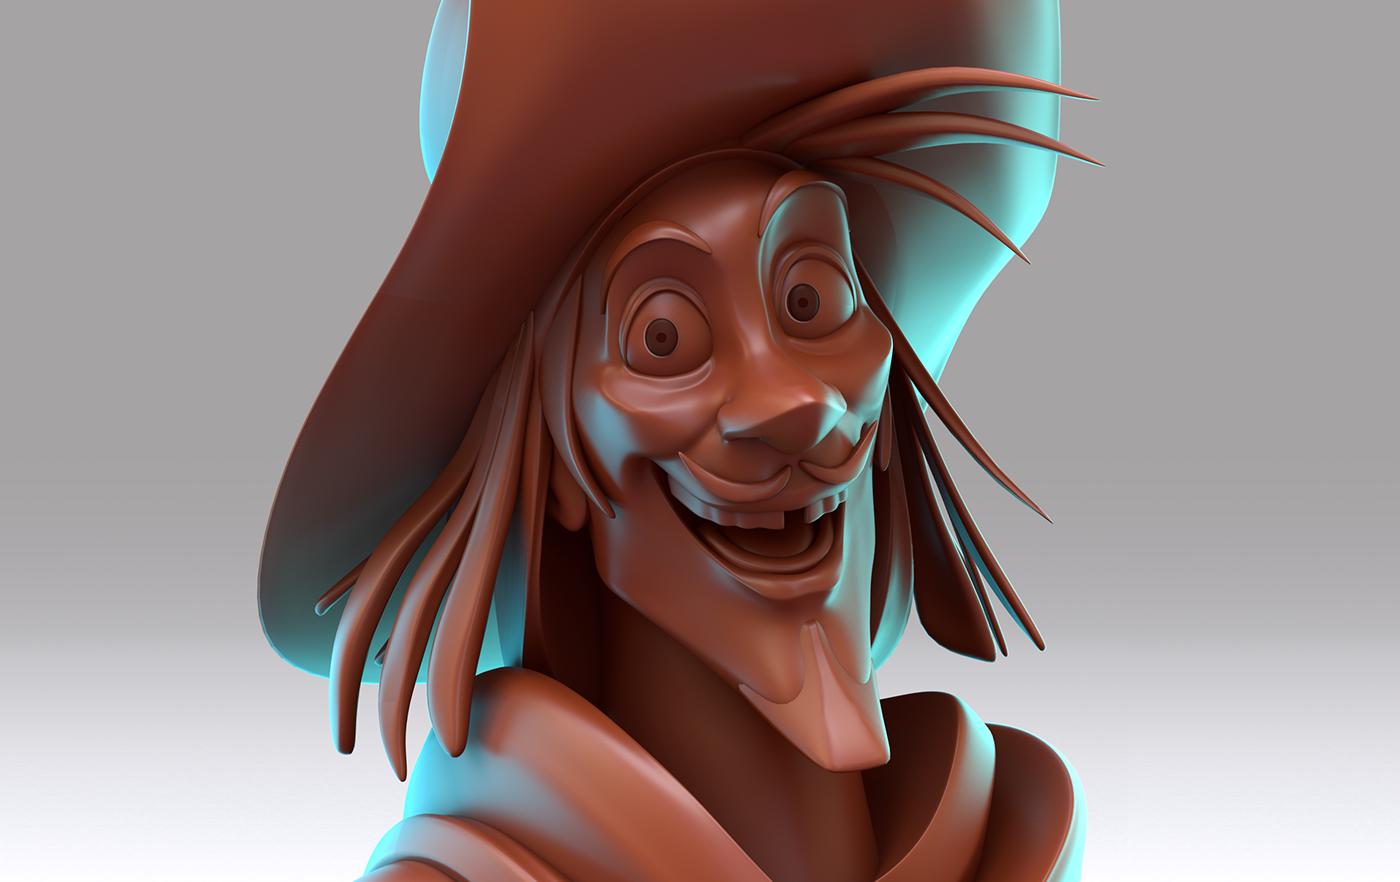 Hansel gretel boris book model 3D ilustration wizard Character